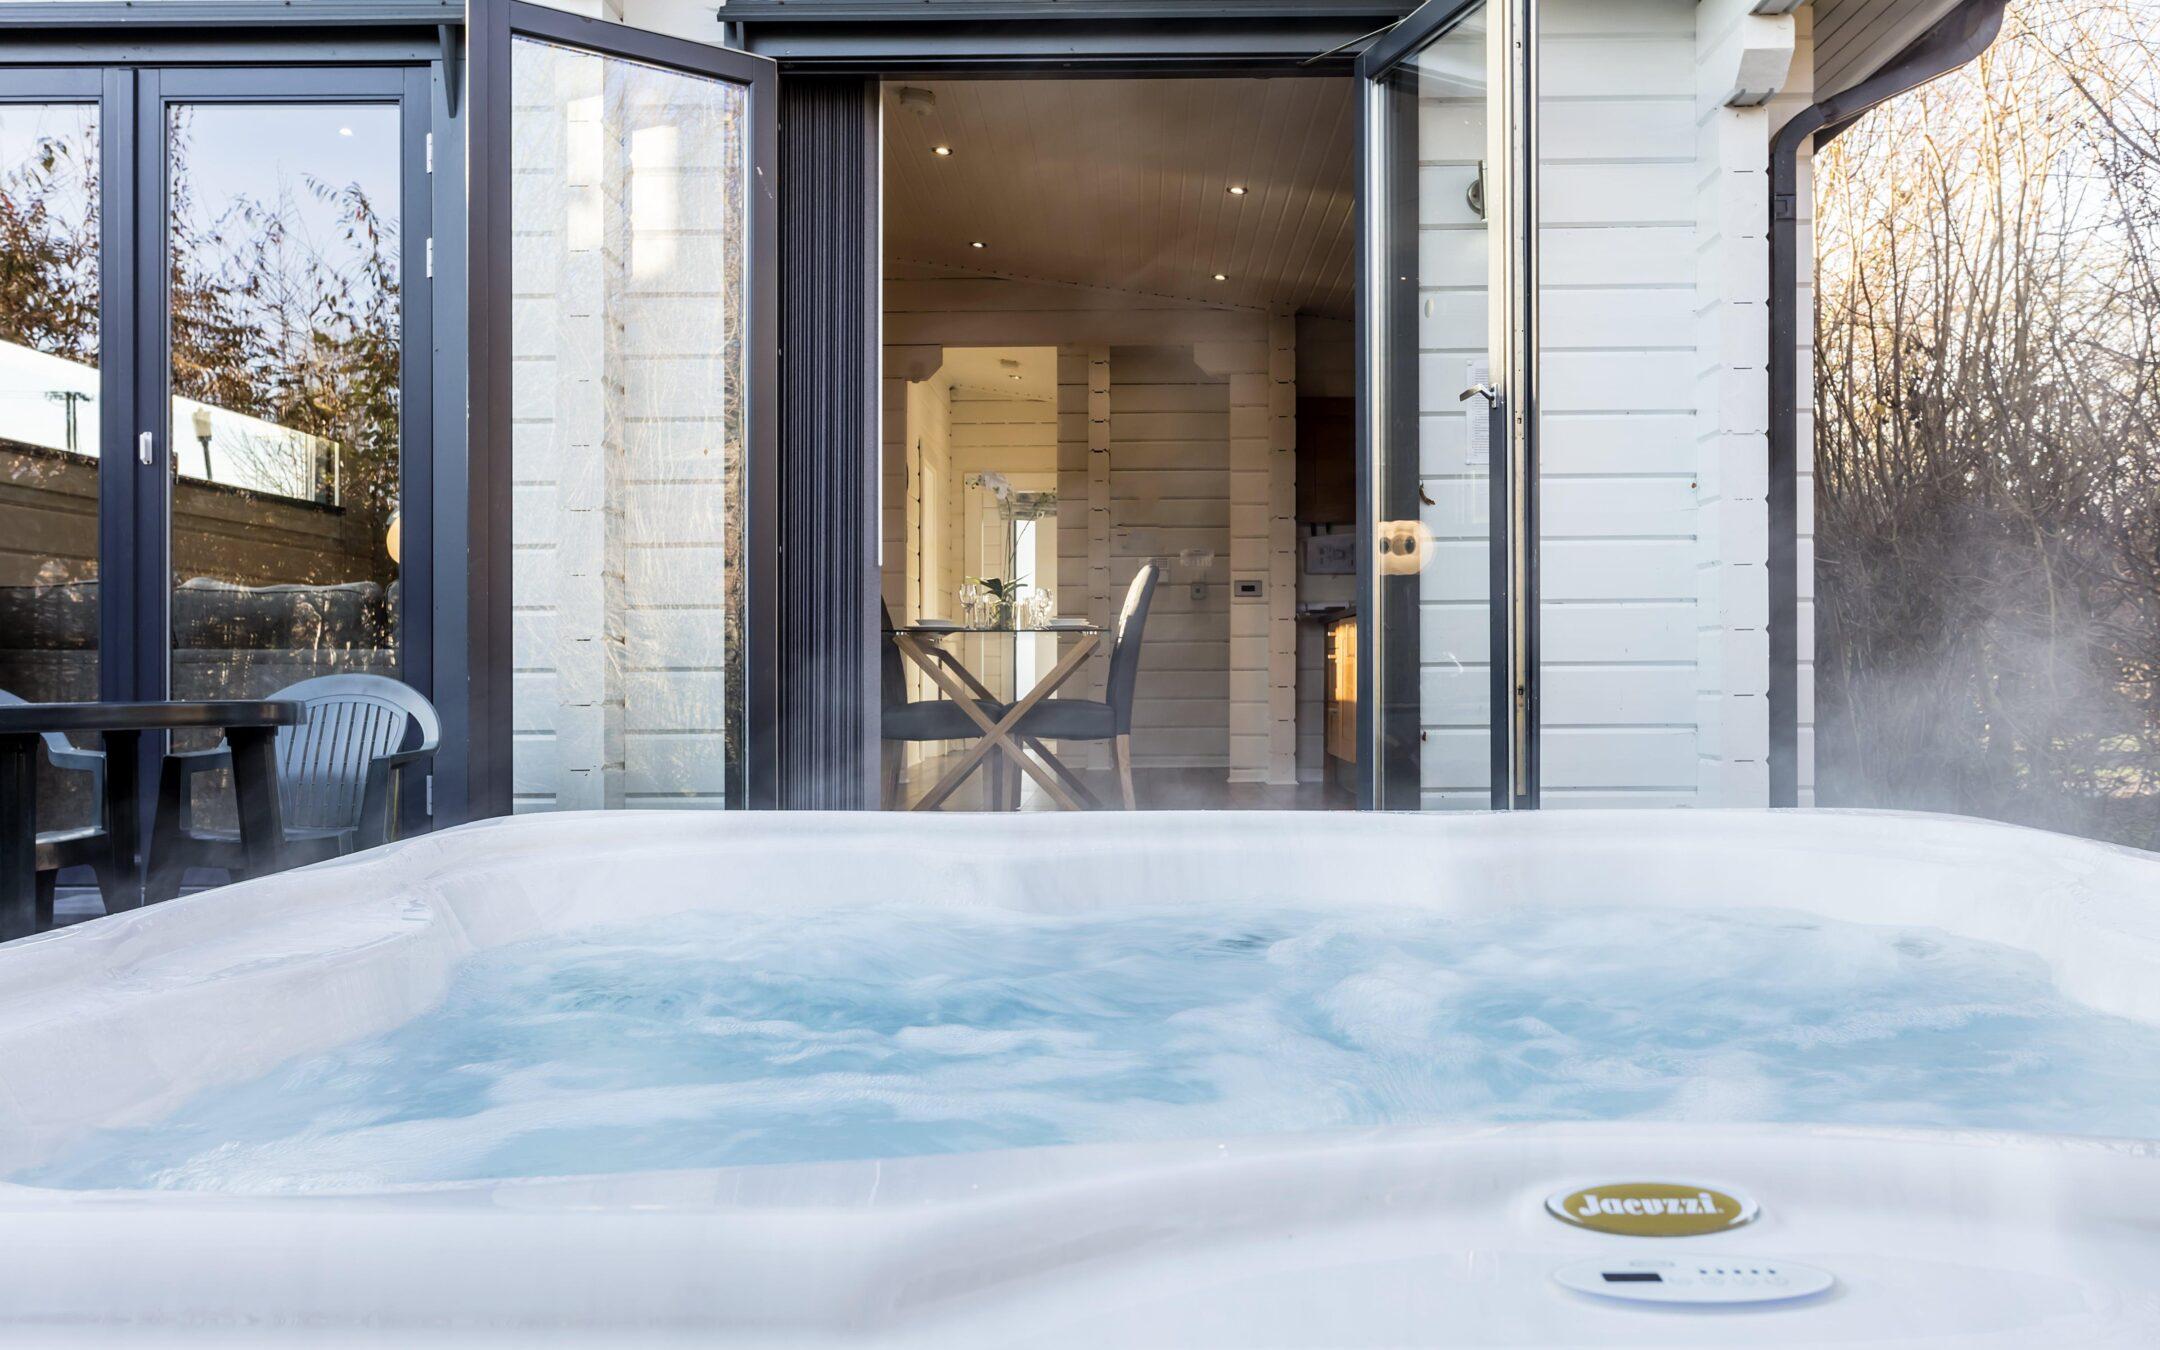 Hot Tub Lodge 16 min